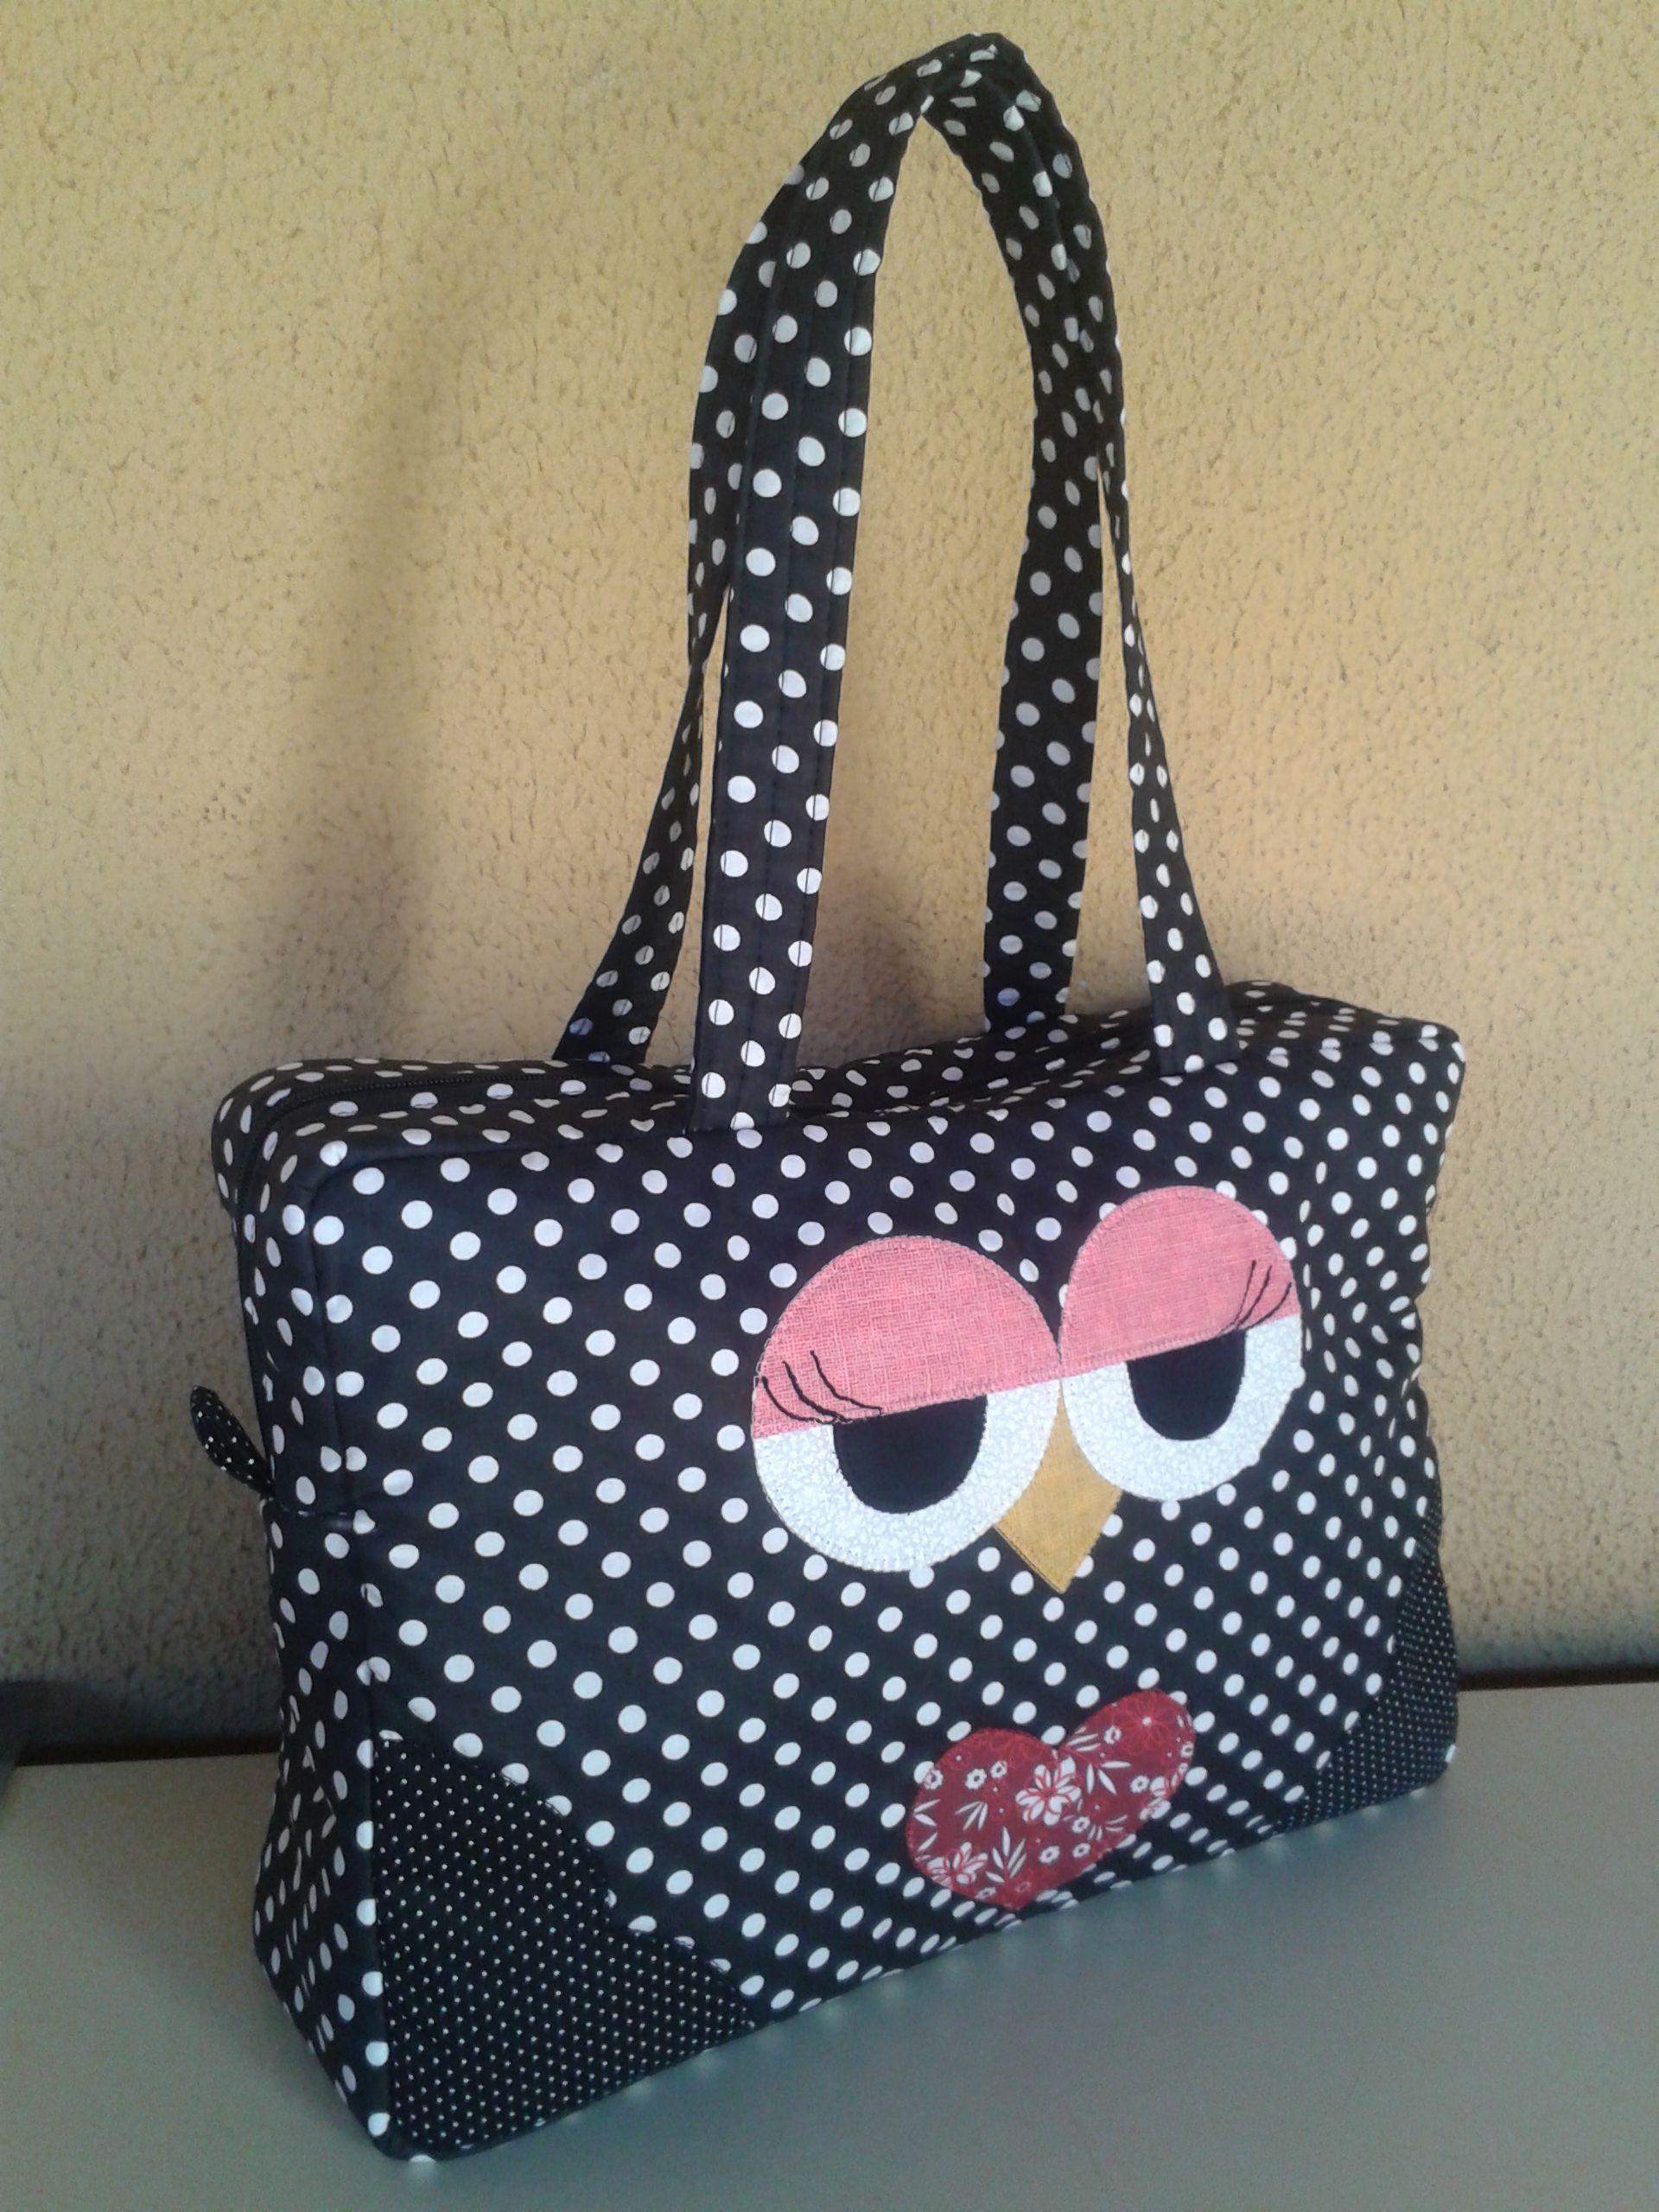 Bolsa De Tecido Pinterest : Bolsa de tecido cara coruja bolsas bag